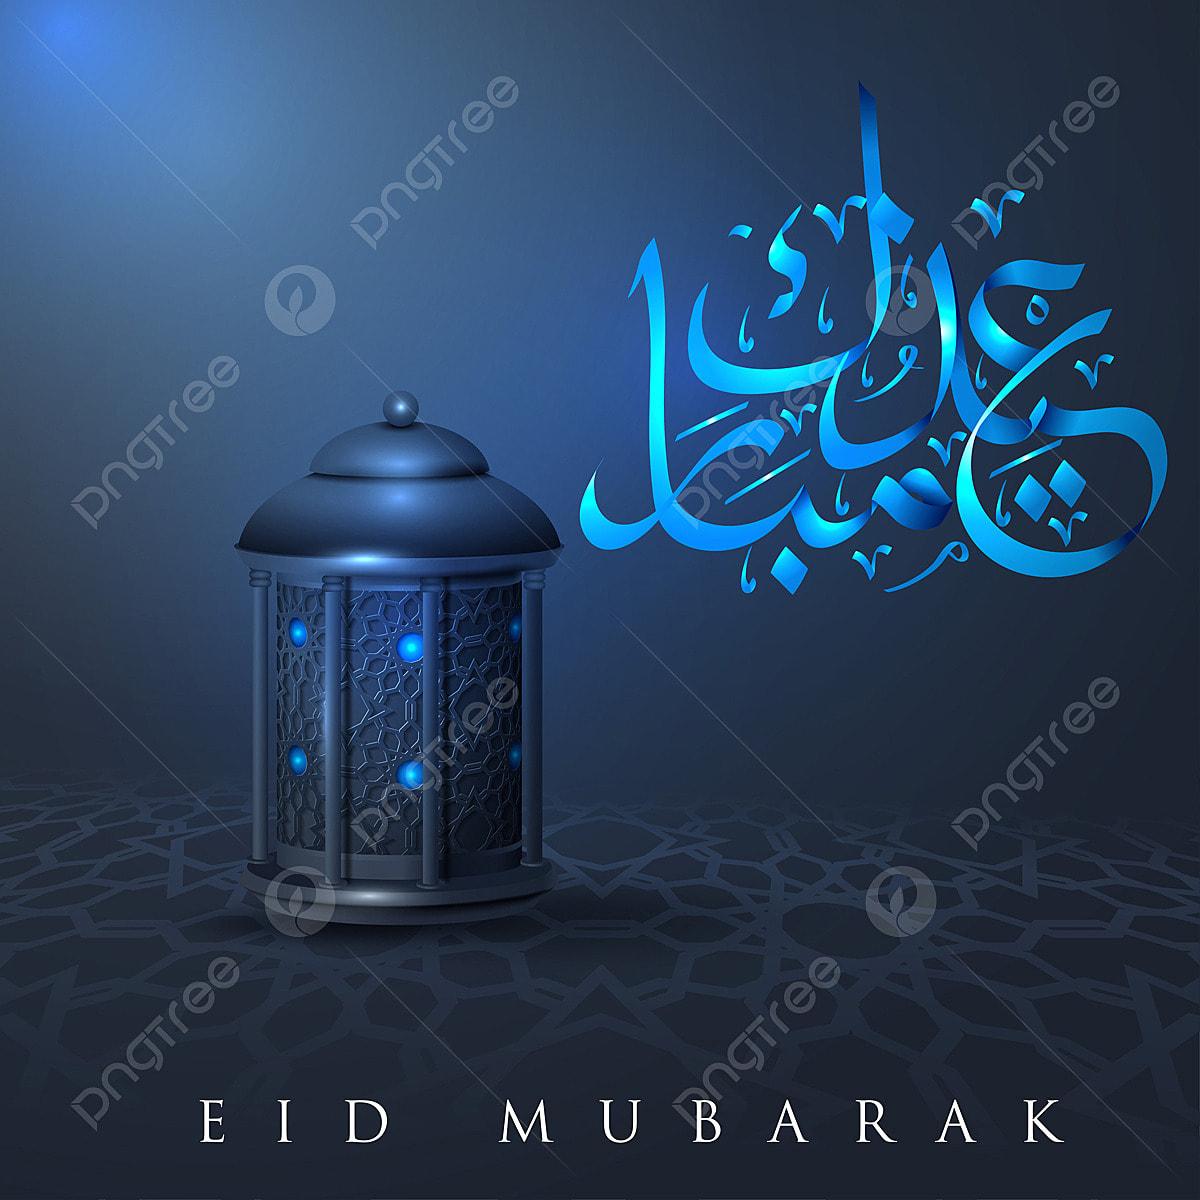 Eid Mubarak Card Images Eid Mubarak Eid Greeting Png Transparent Background